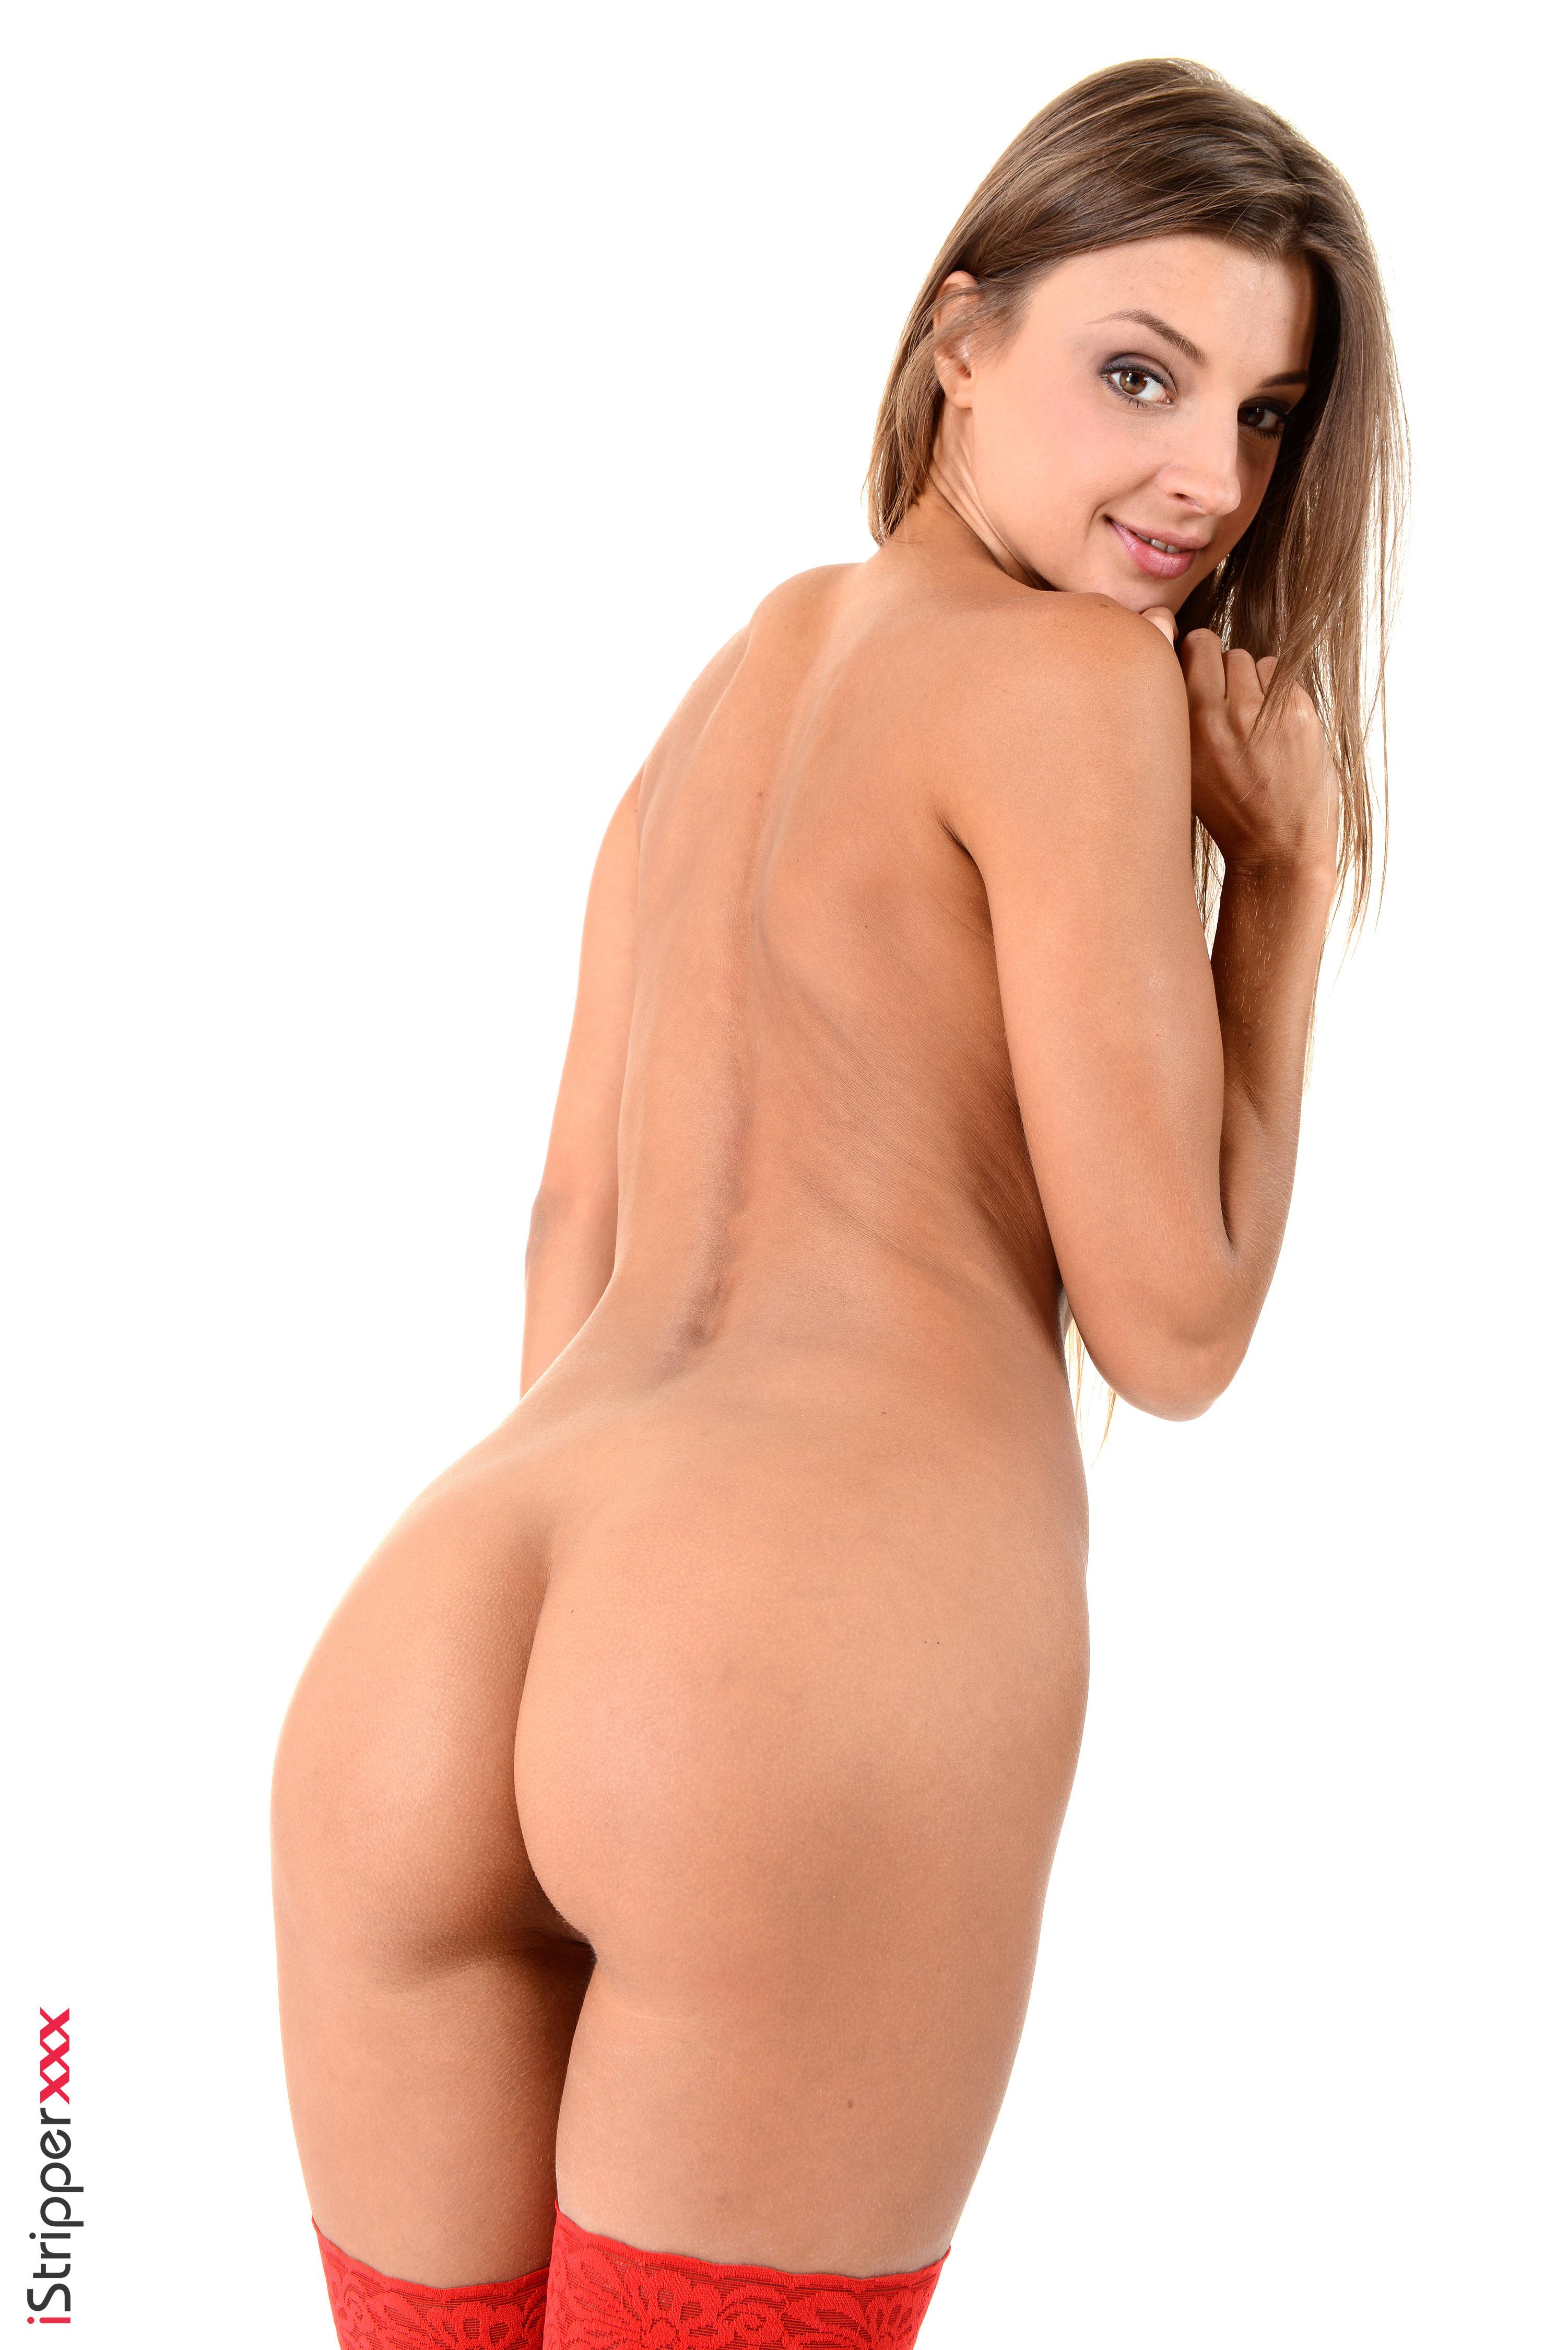 hd wallpapers hd nude hd metart katya